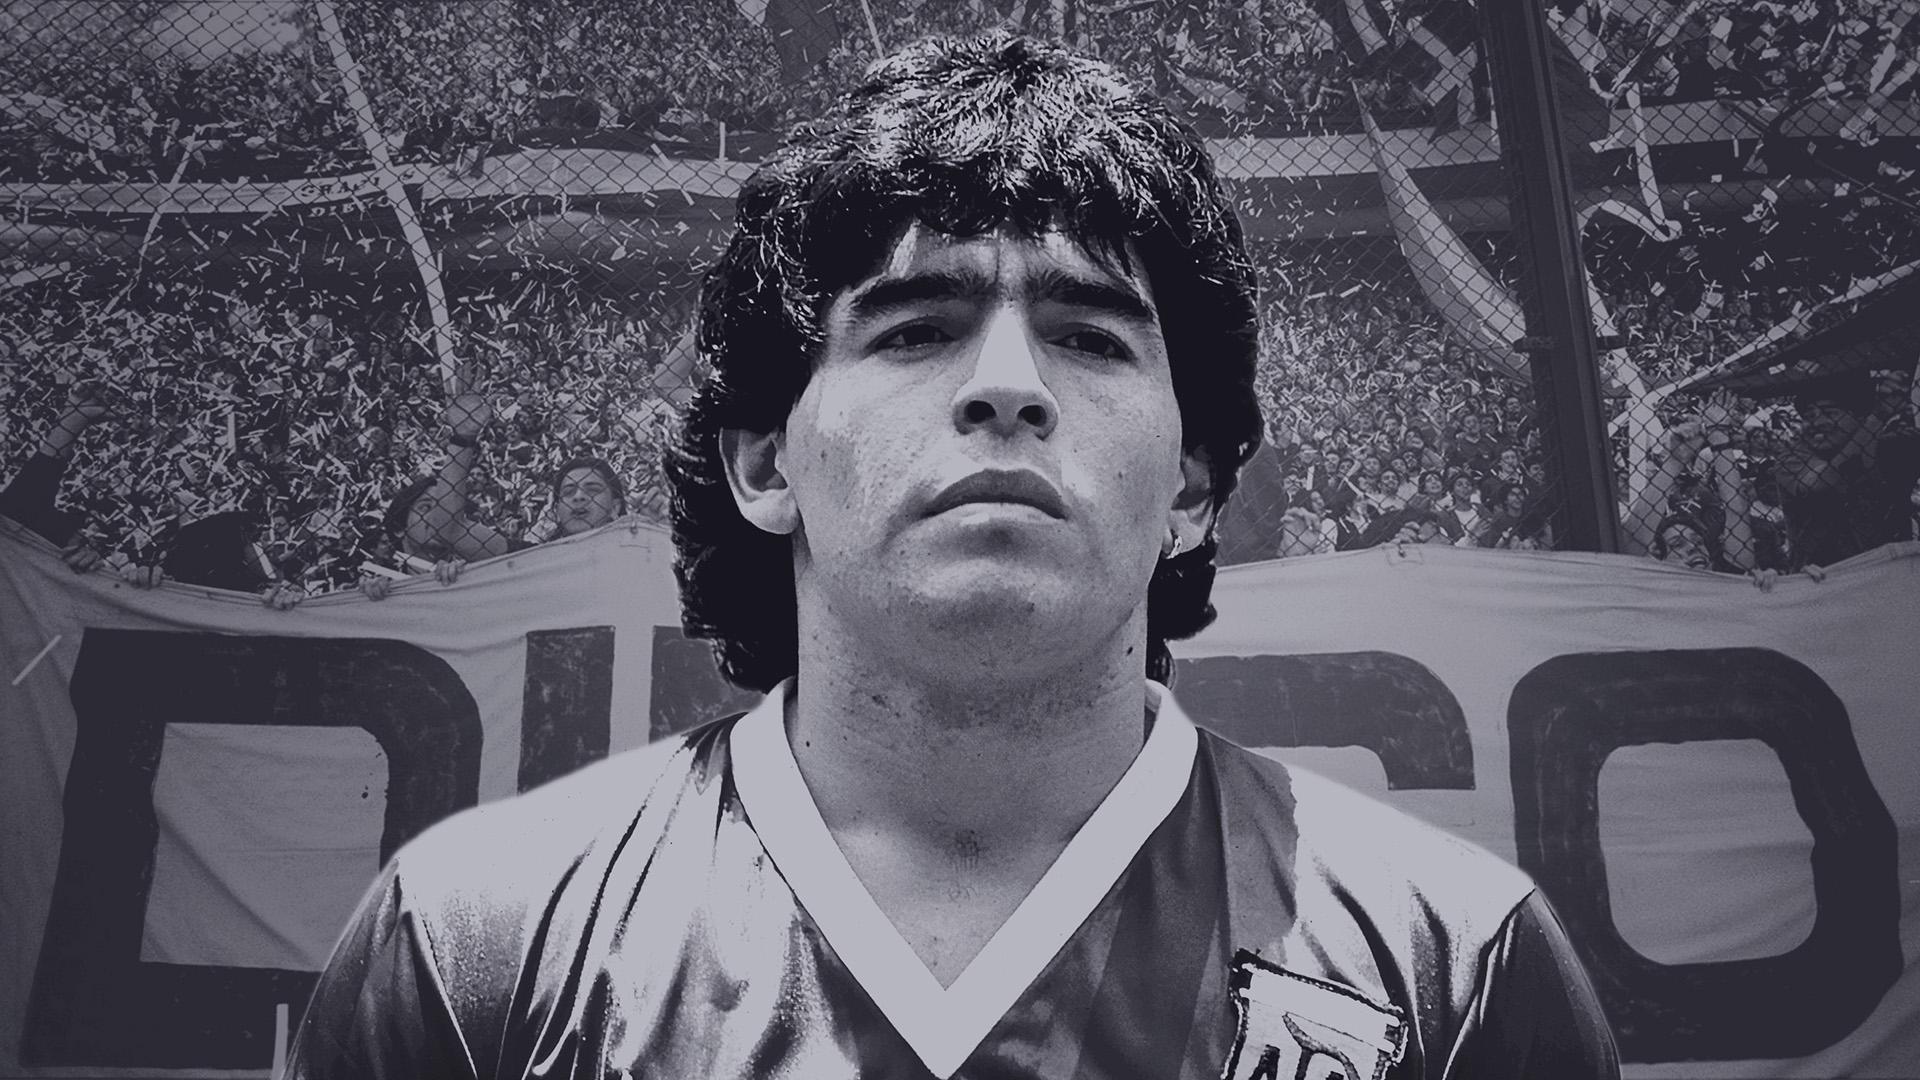 Diego Maradona Dead at 60, Soccer Legend Dies Weeks After Brain Surgery